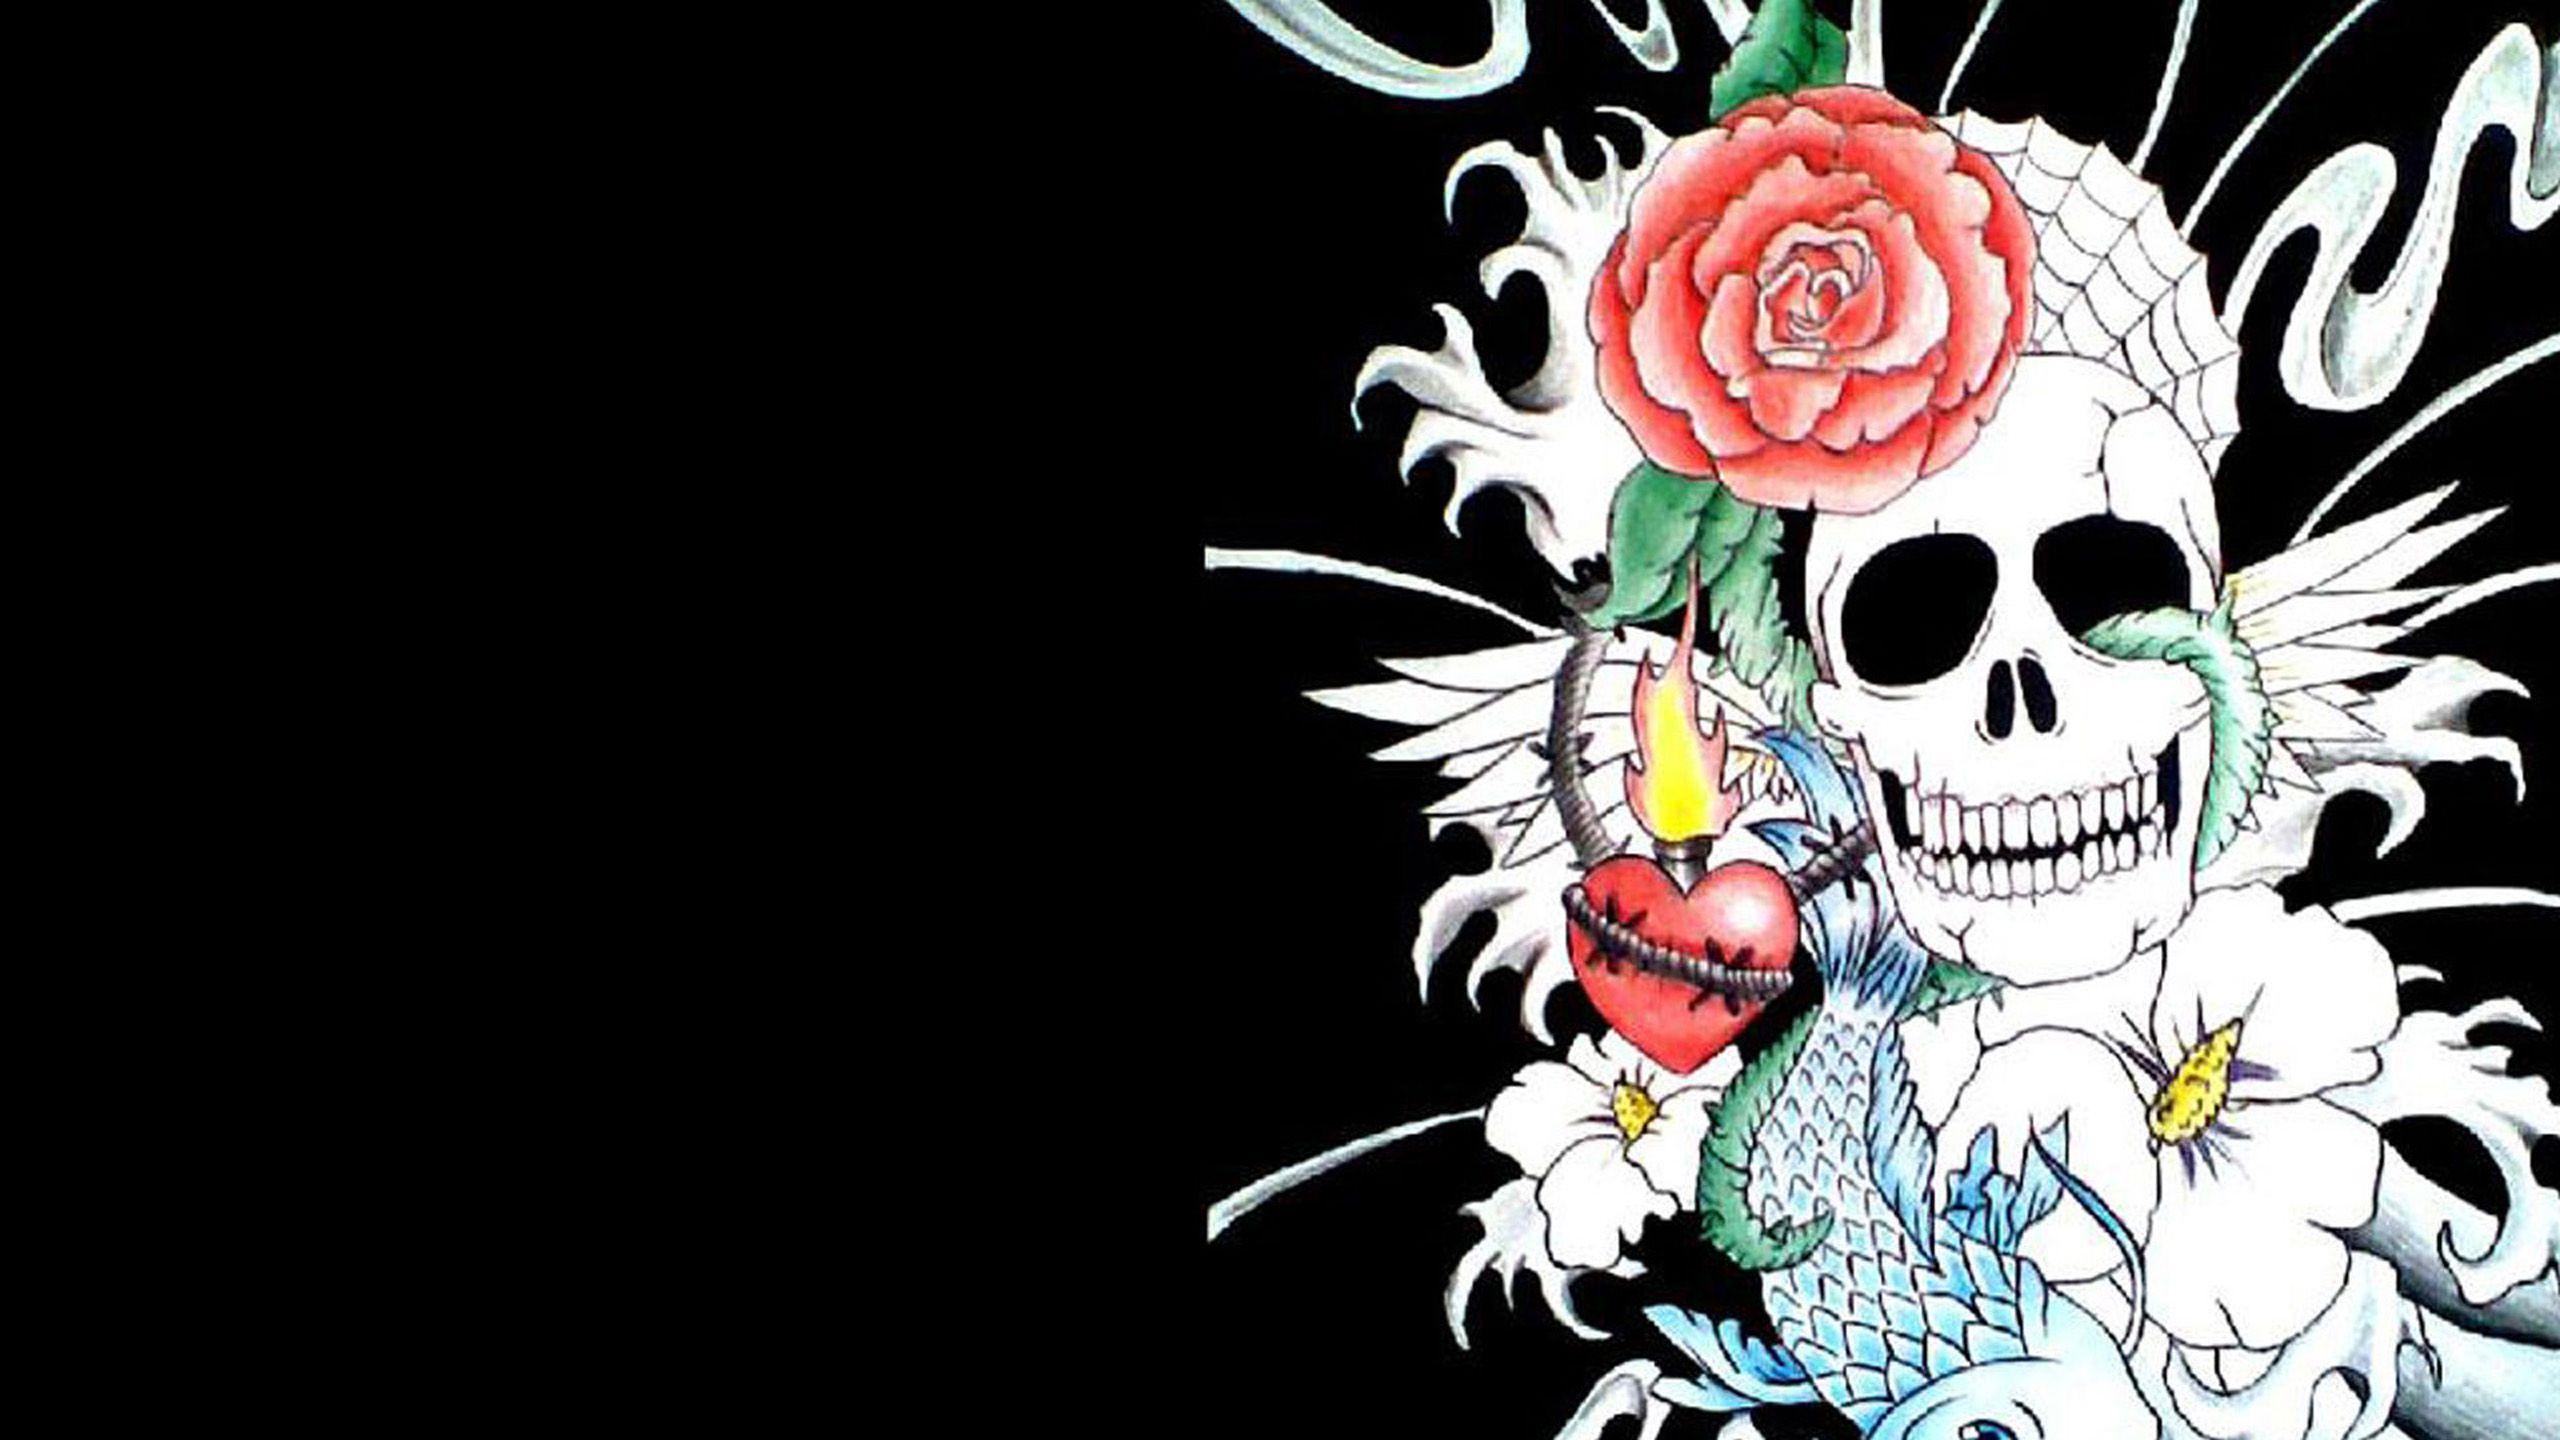 wallpapers skull desktop - photo #23